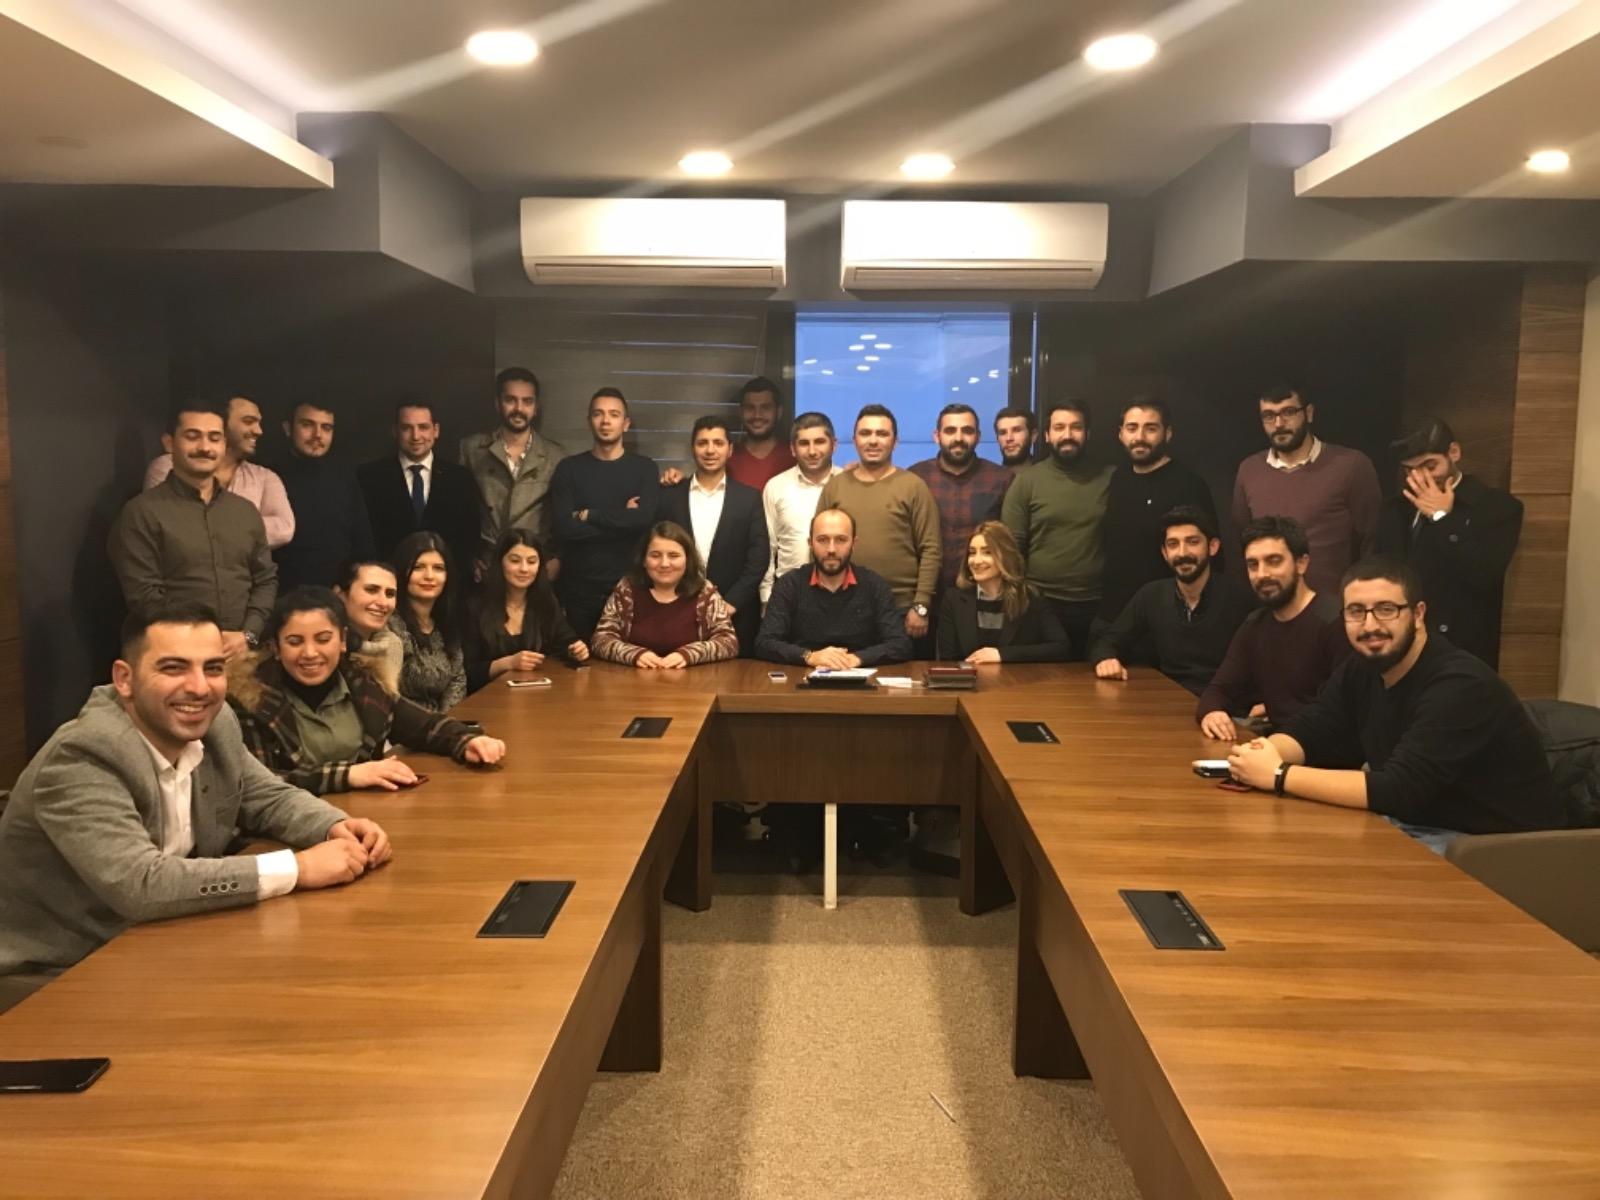 Kars-Ardahan-Iğdır Vakfı CHP'yi ziyaret etti